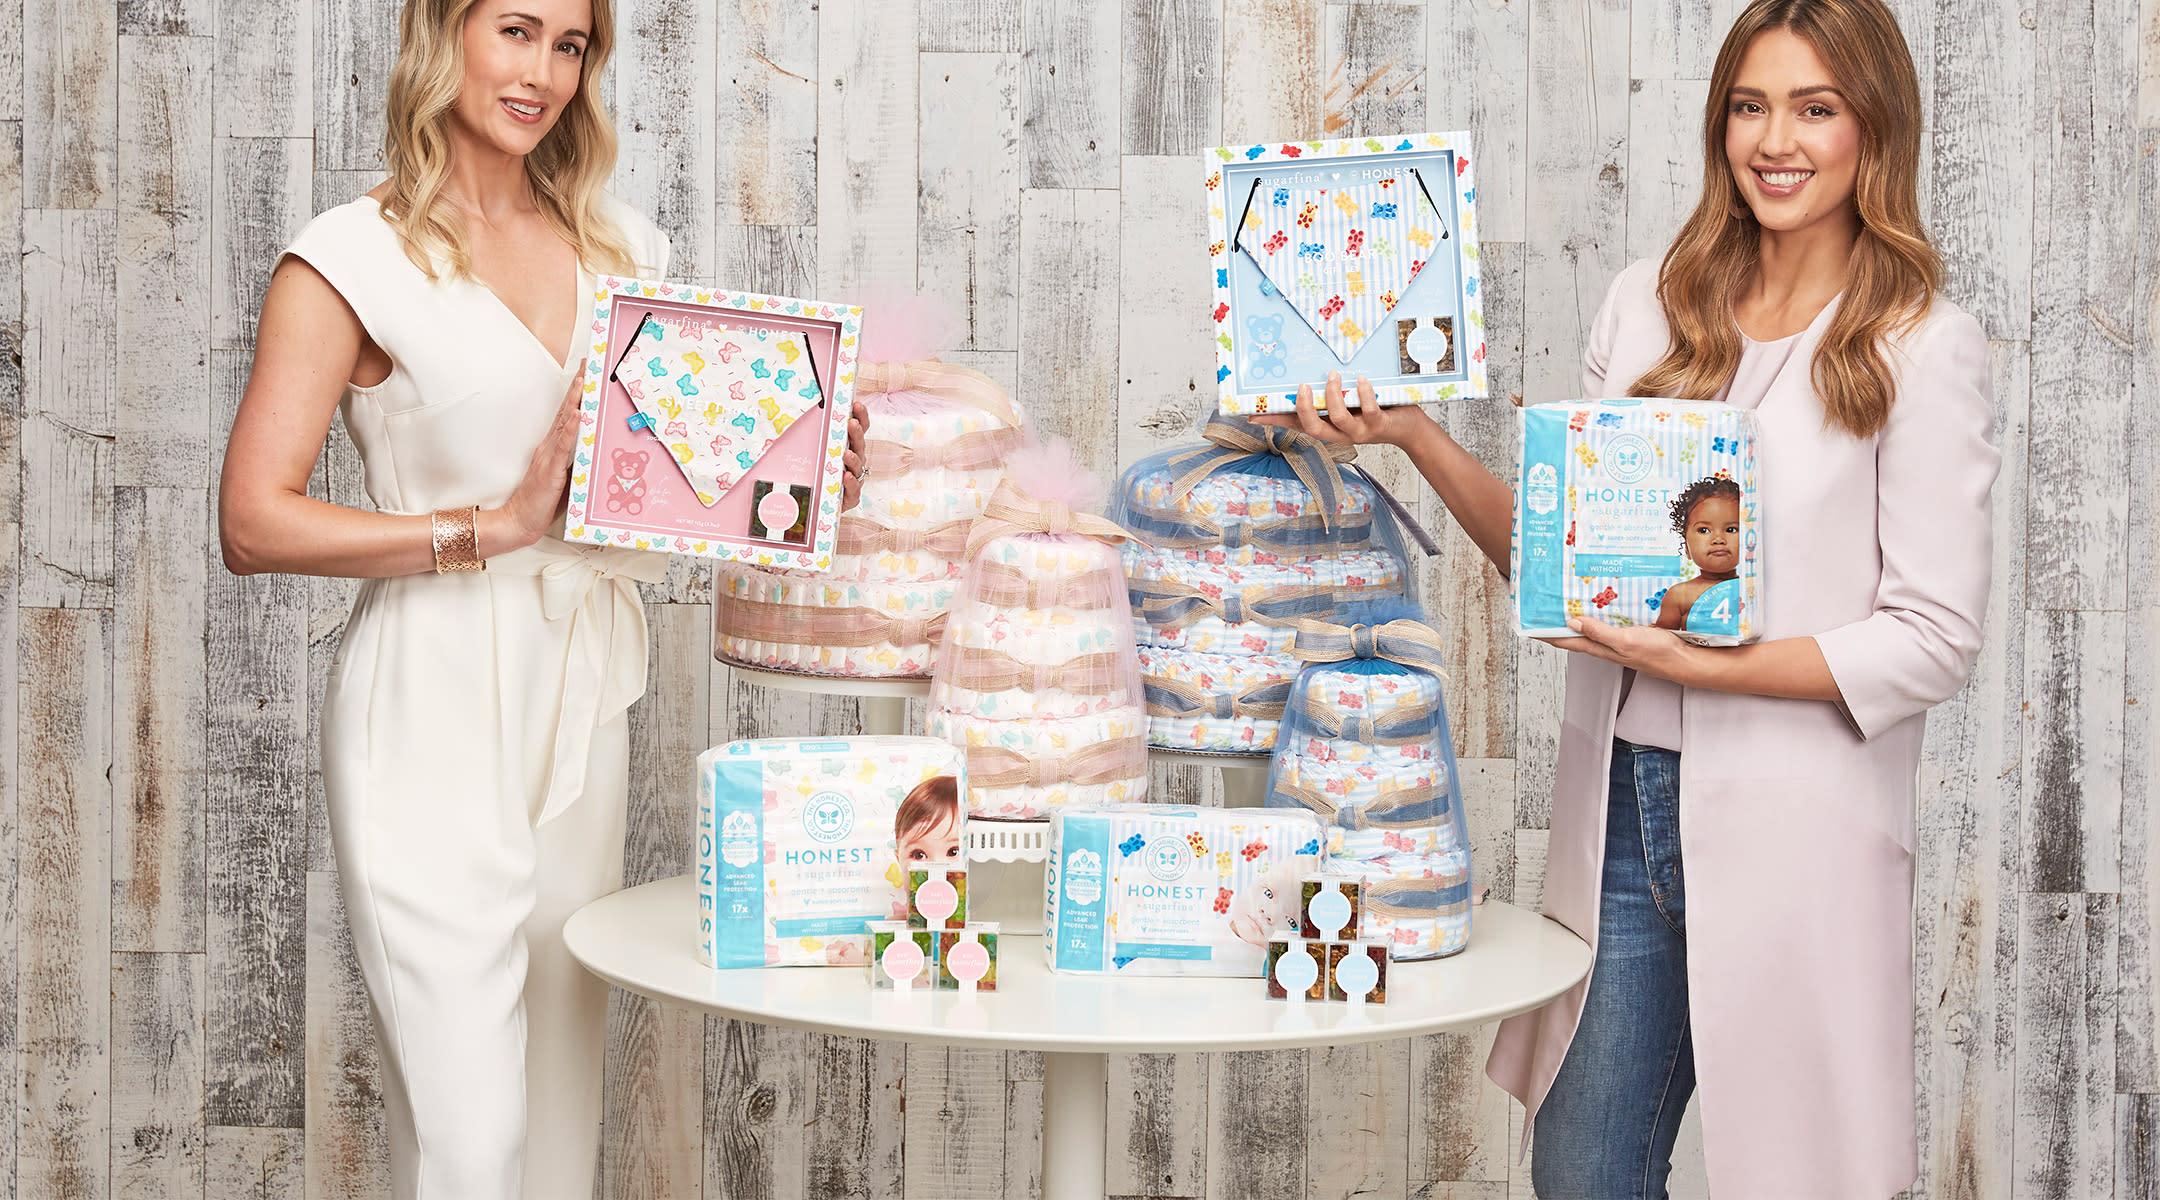 Jessica Alba Sugarfina Launch Baby Shower Collection